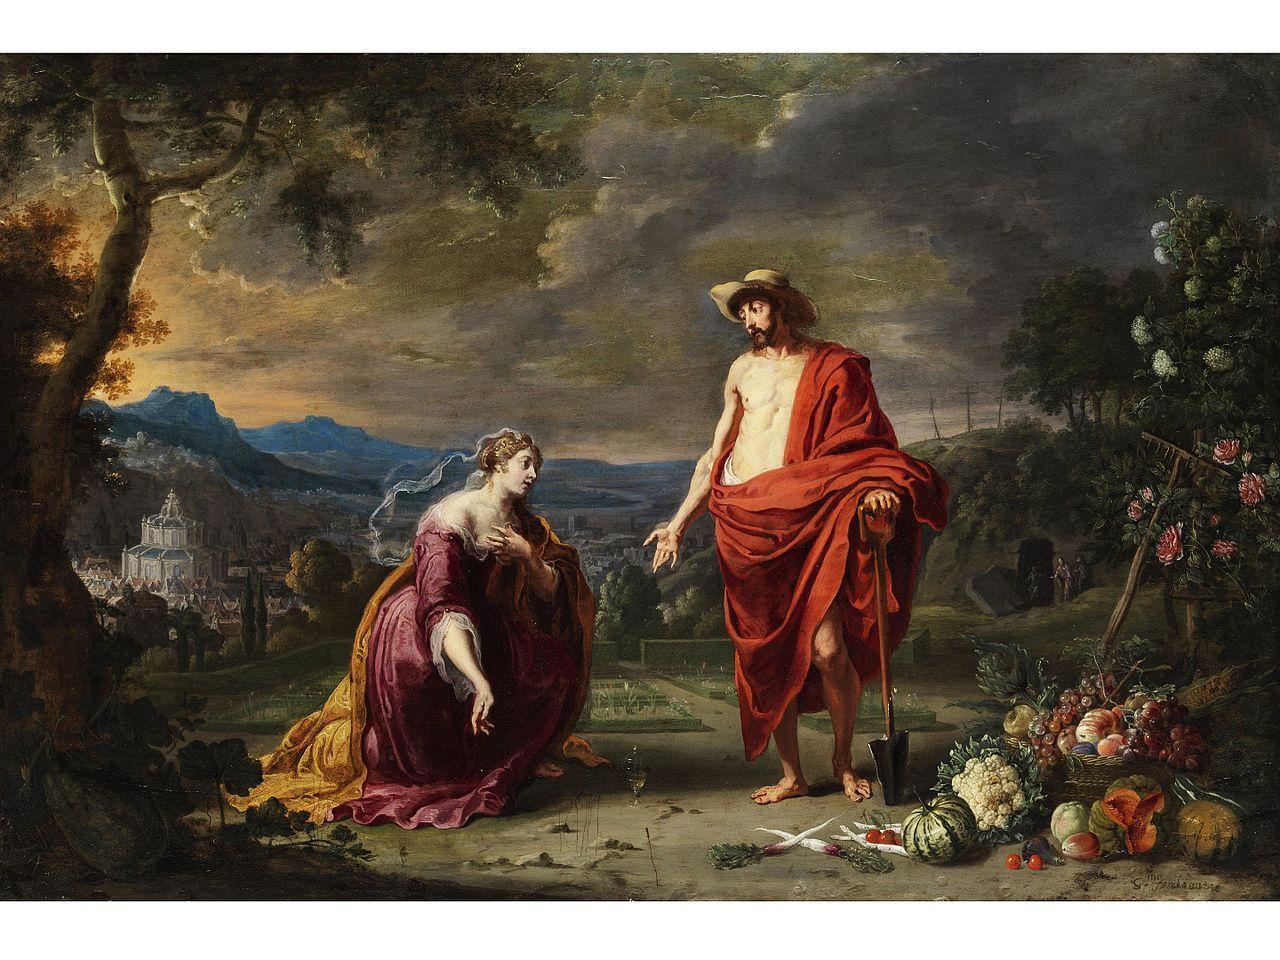 Category Pieter Gijsels Willem Forchont Noli Me Tangere Jpg Noli Me Tangere Art Mary Magdalene